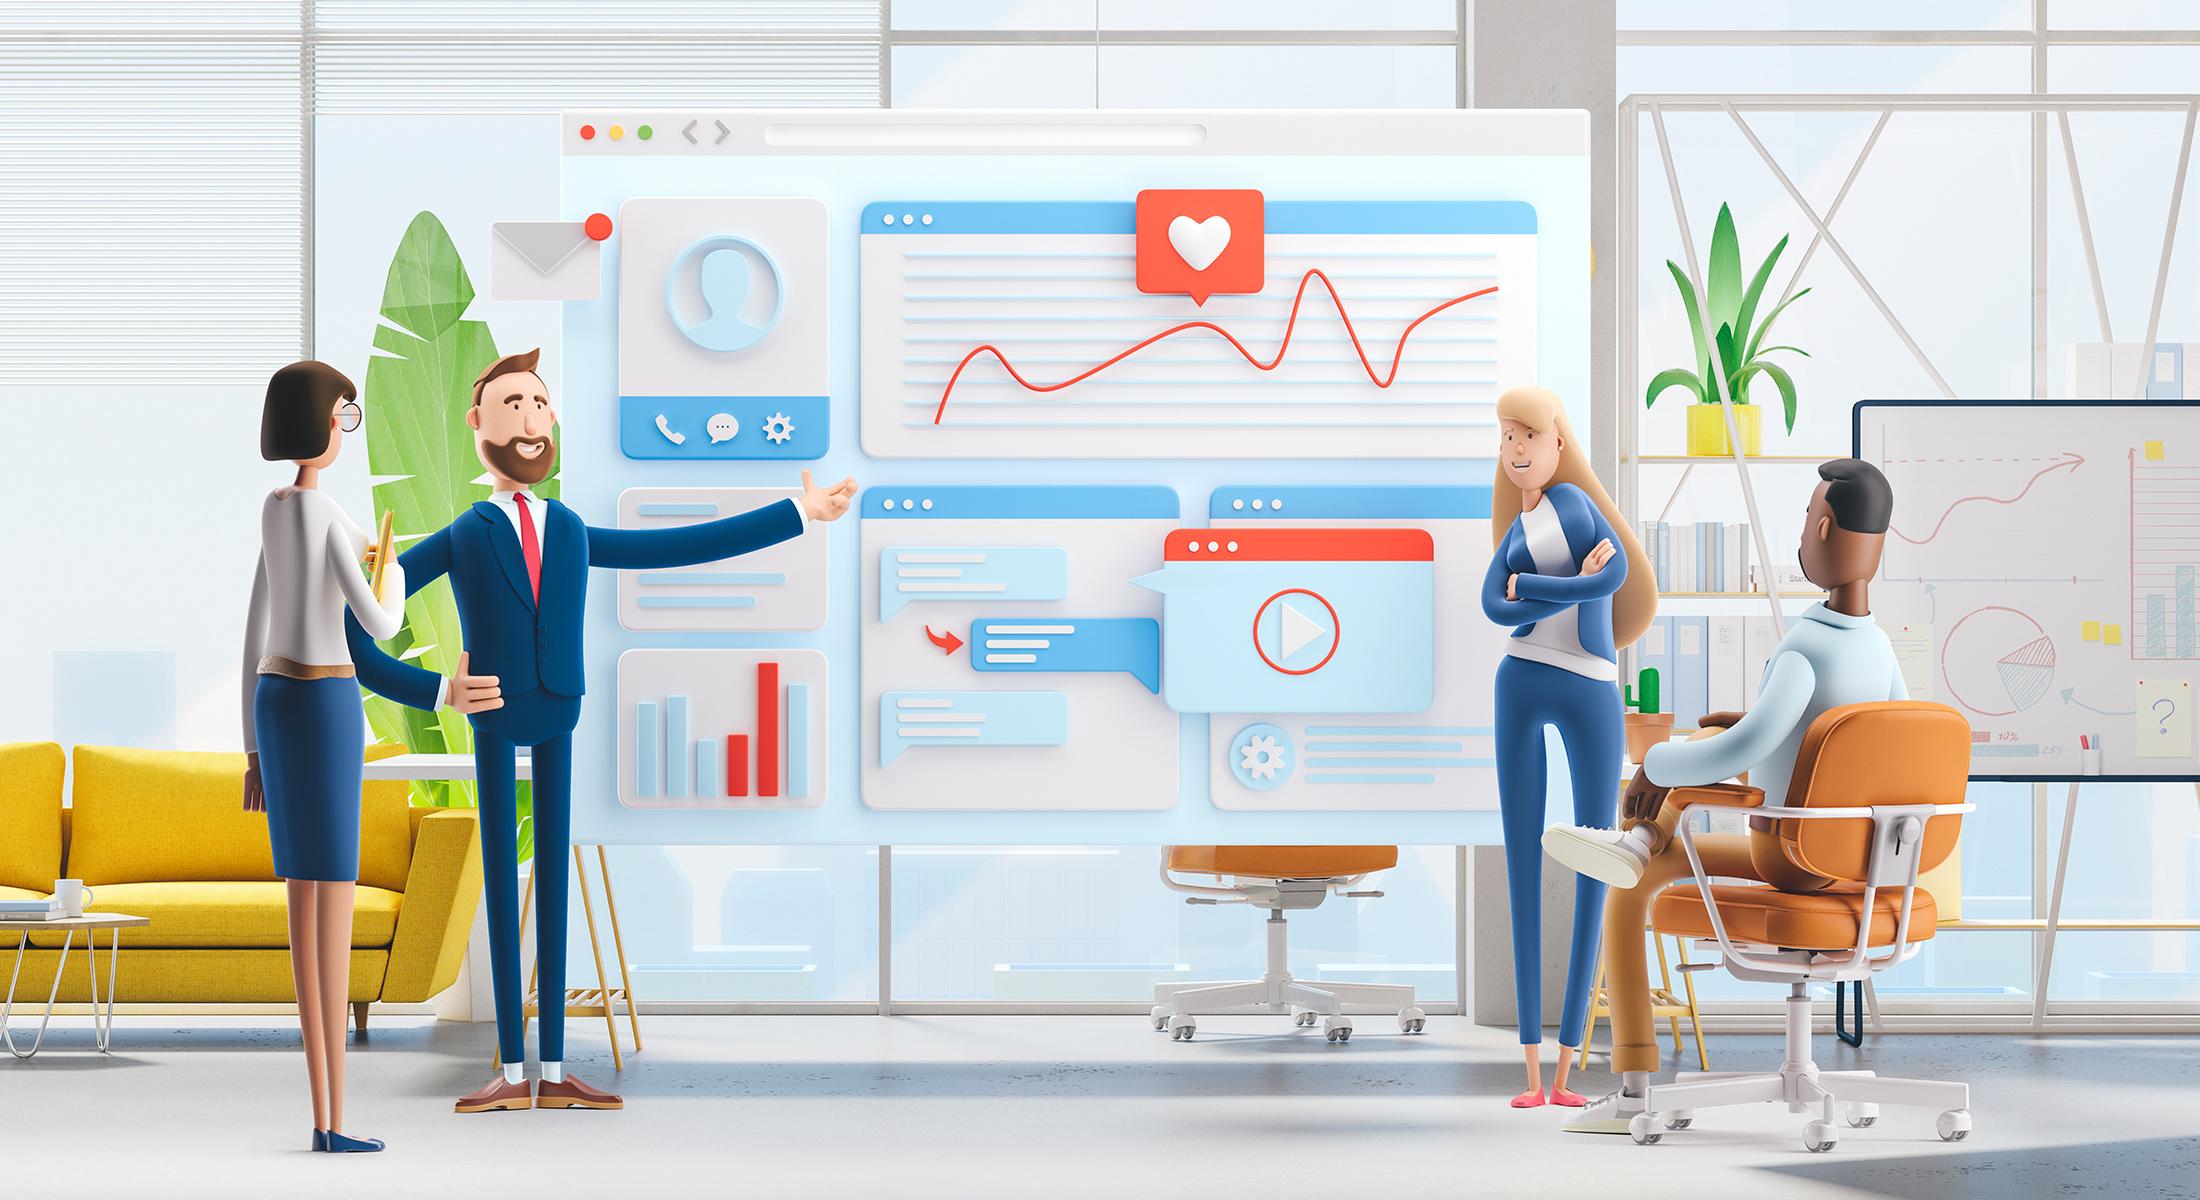 MCSH Veranstaltung: Digitales Lead Management